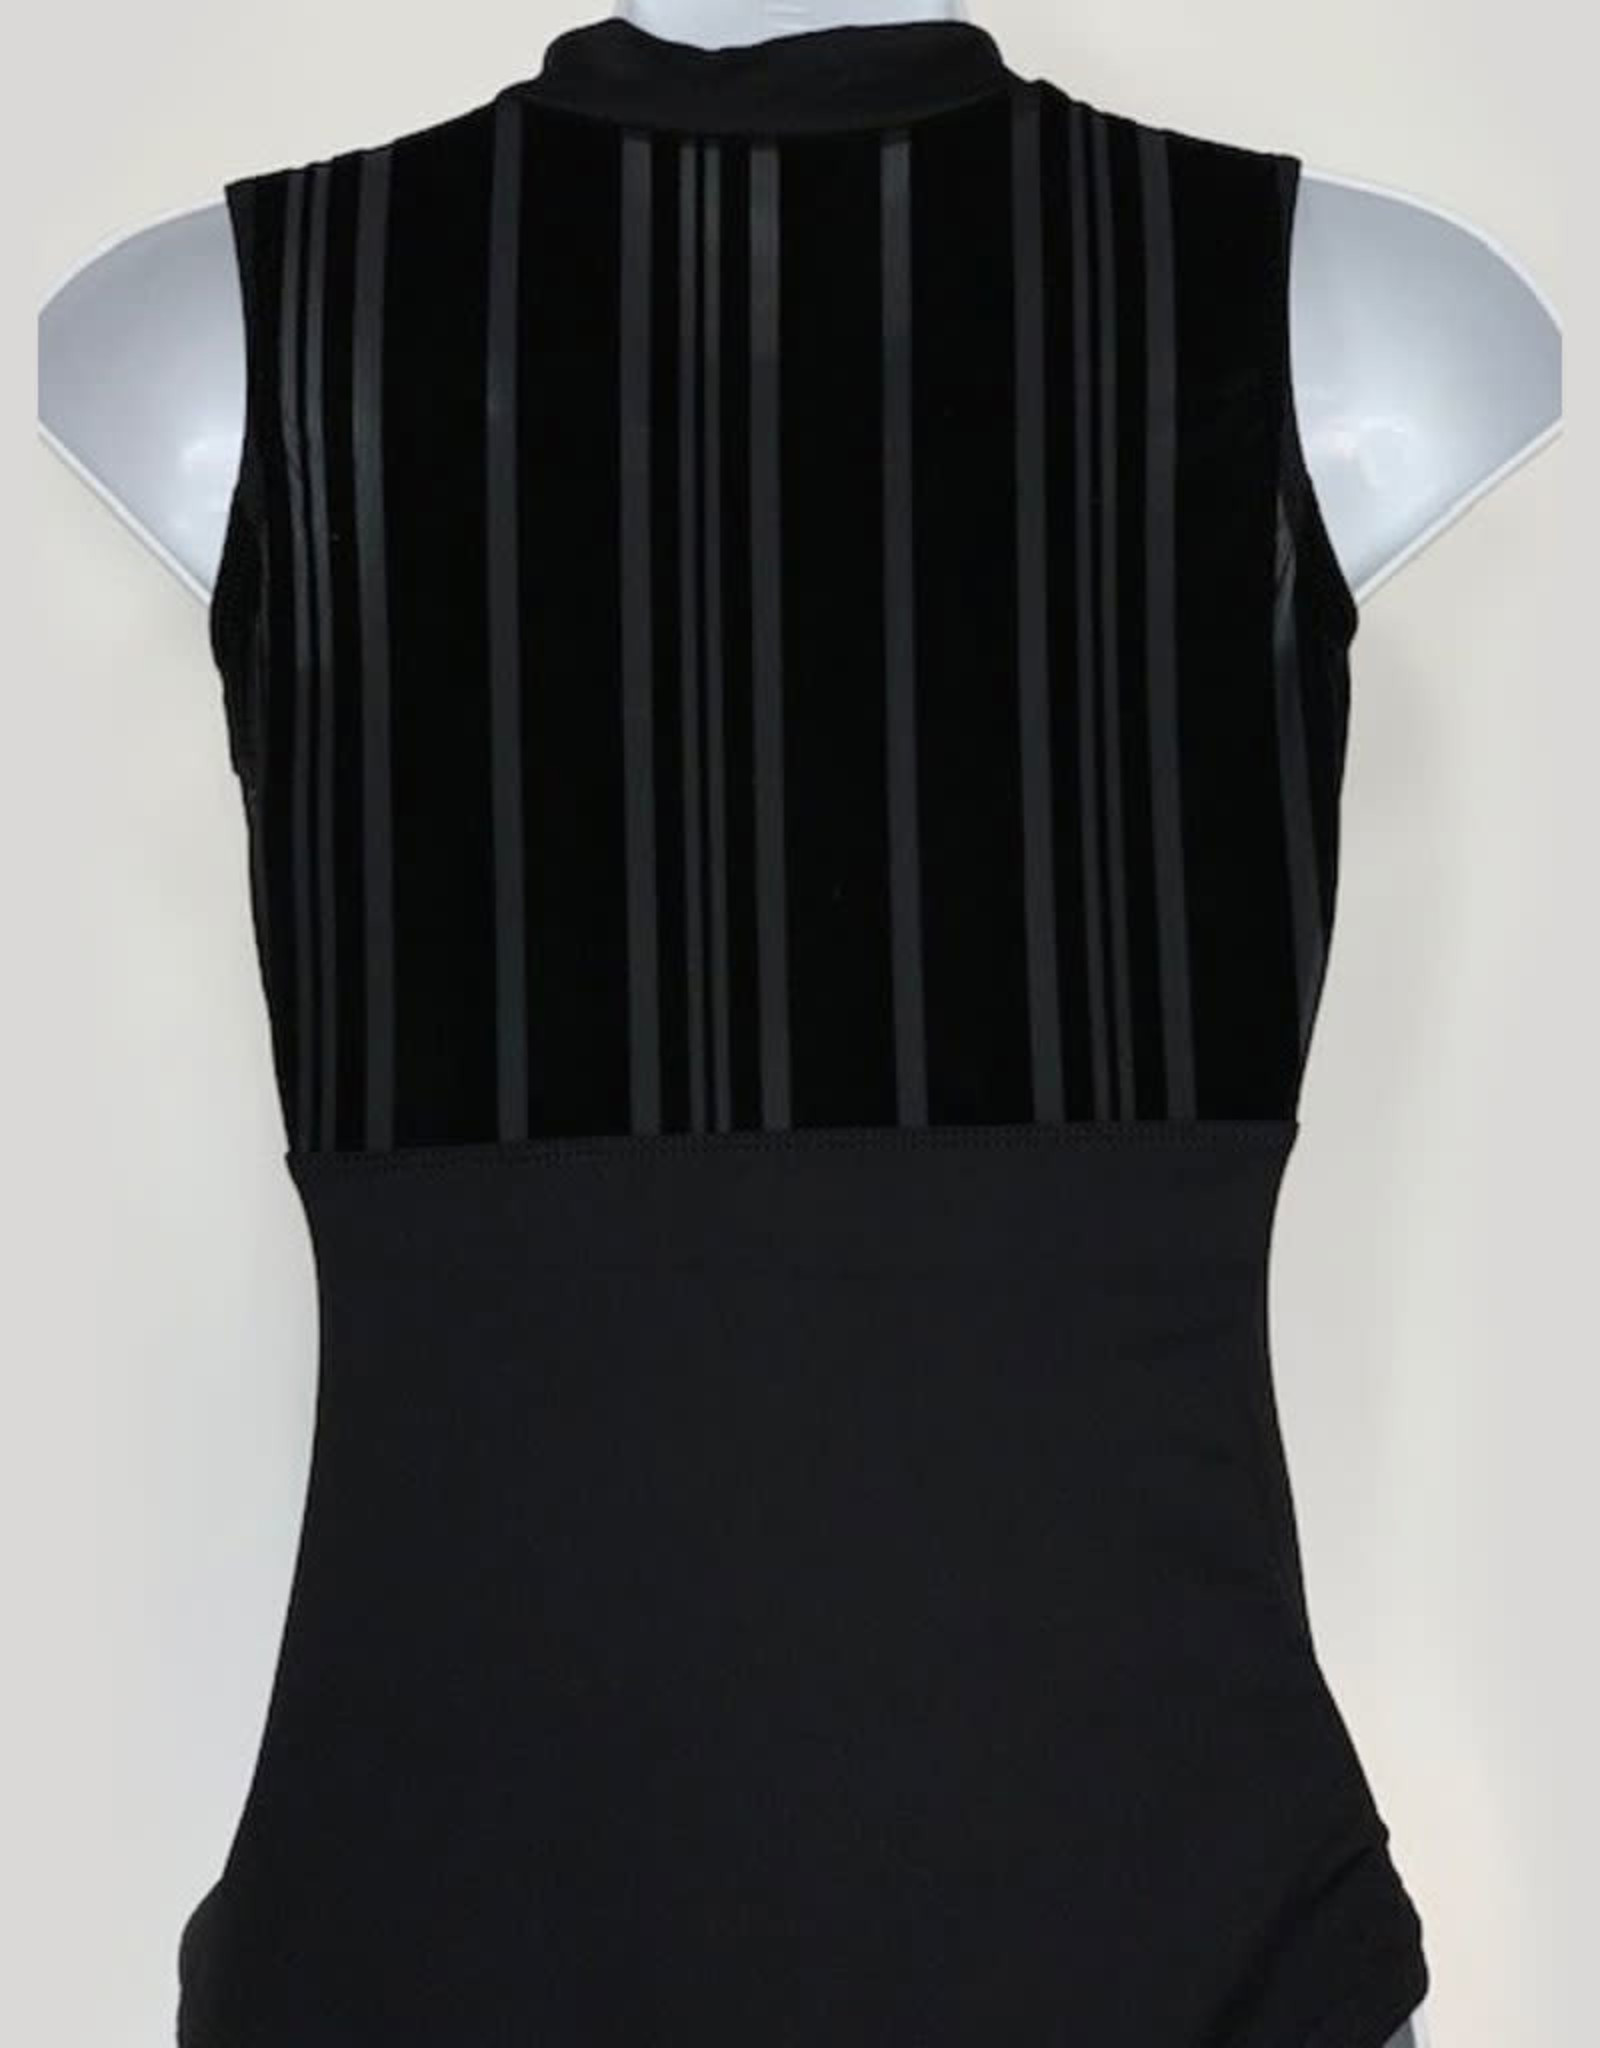 Motionwear Leotard style 2464